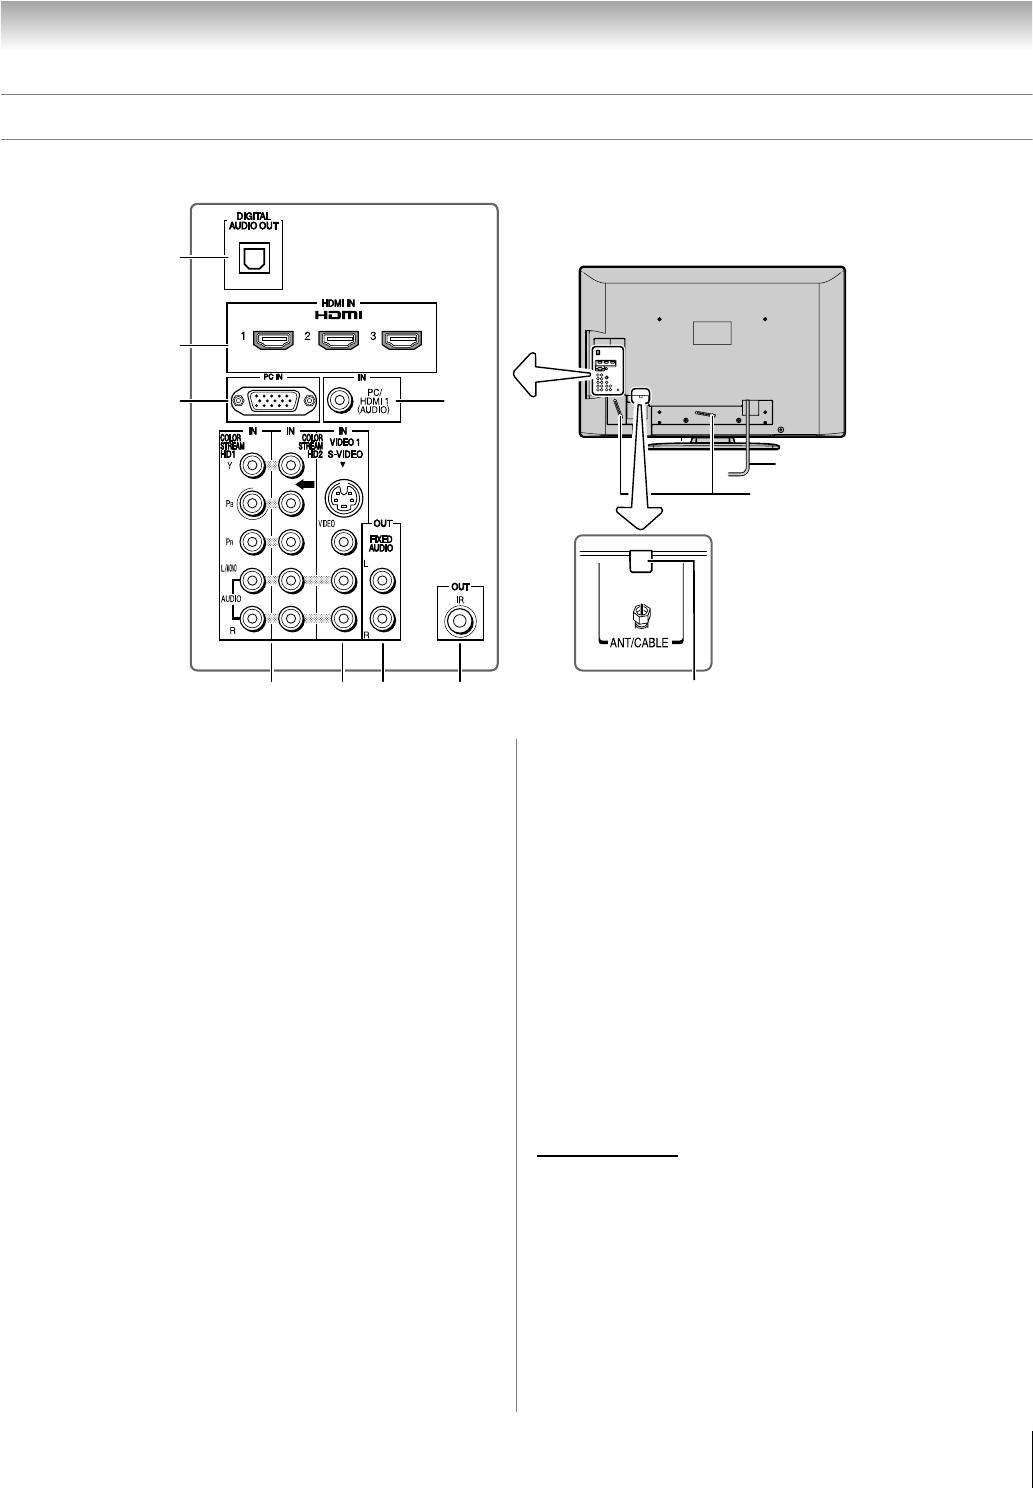 Toshiba 42xv540u Owners Manual Swi Rc Wiring Diagram Kia 11